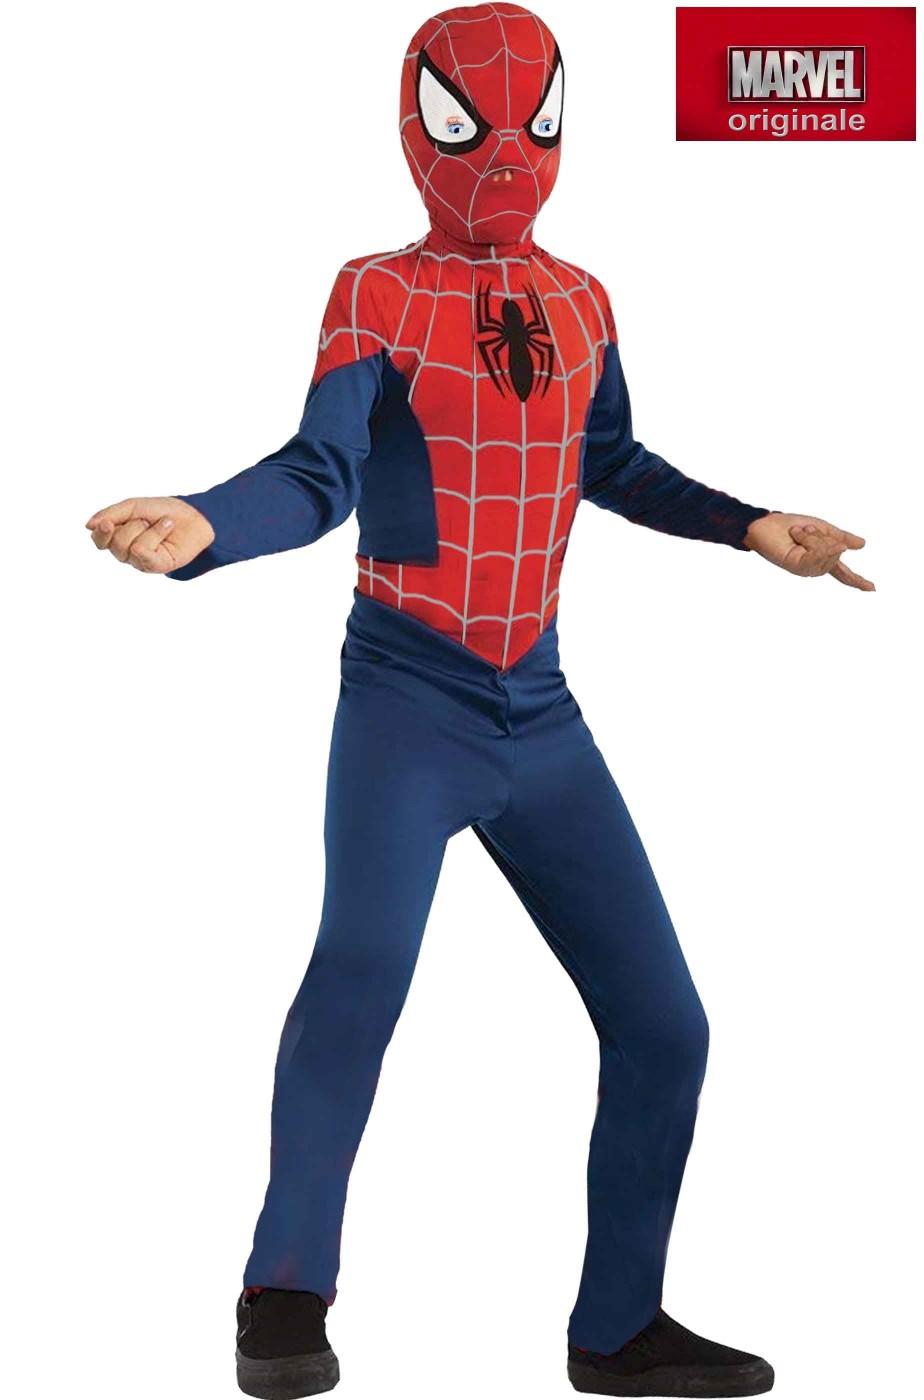 Costume Spiderman The Movie